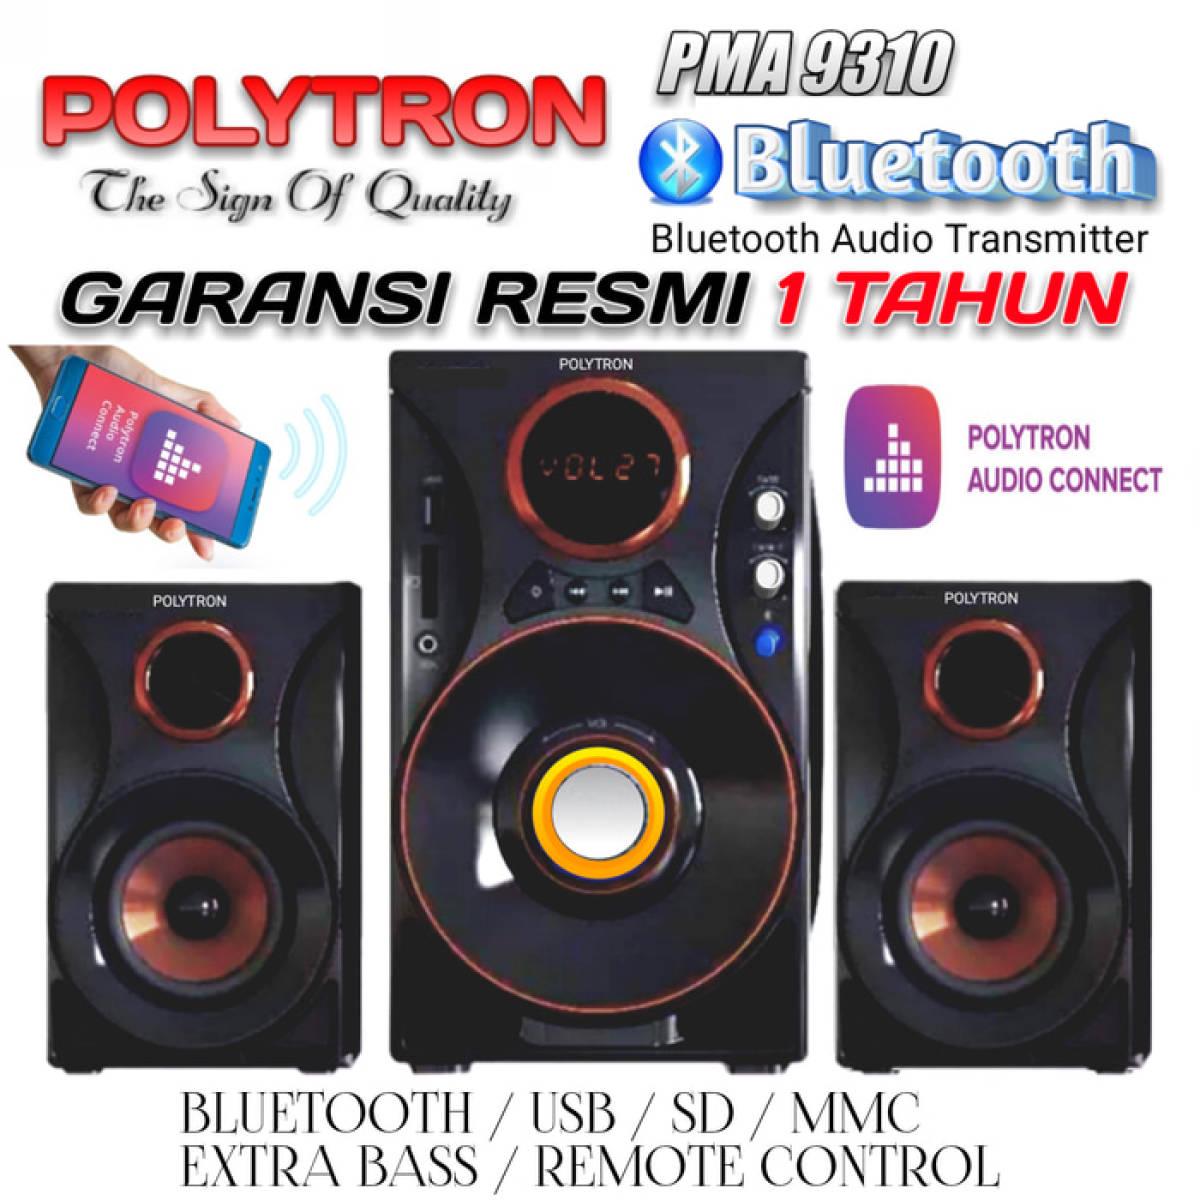 Jual Produk Polytron Terbaru | lazada.co.id